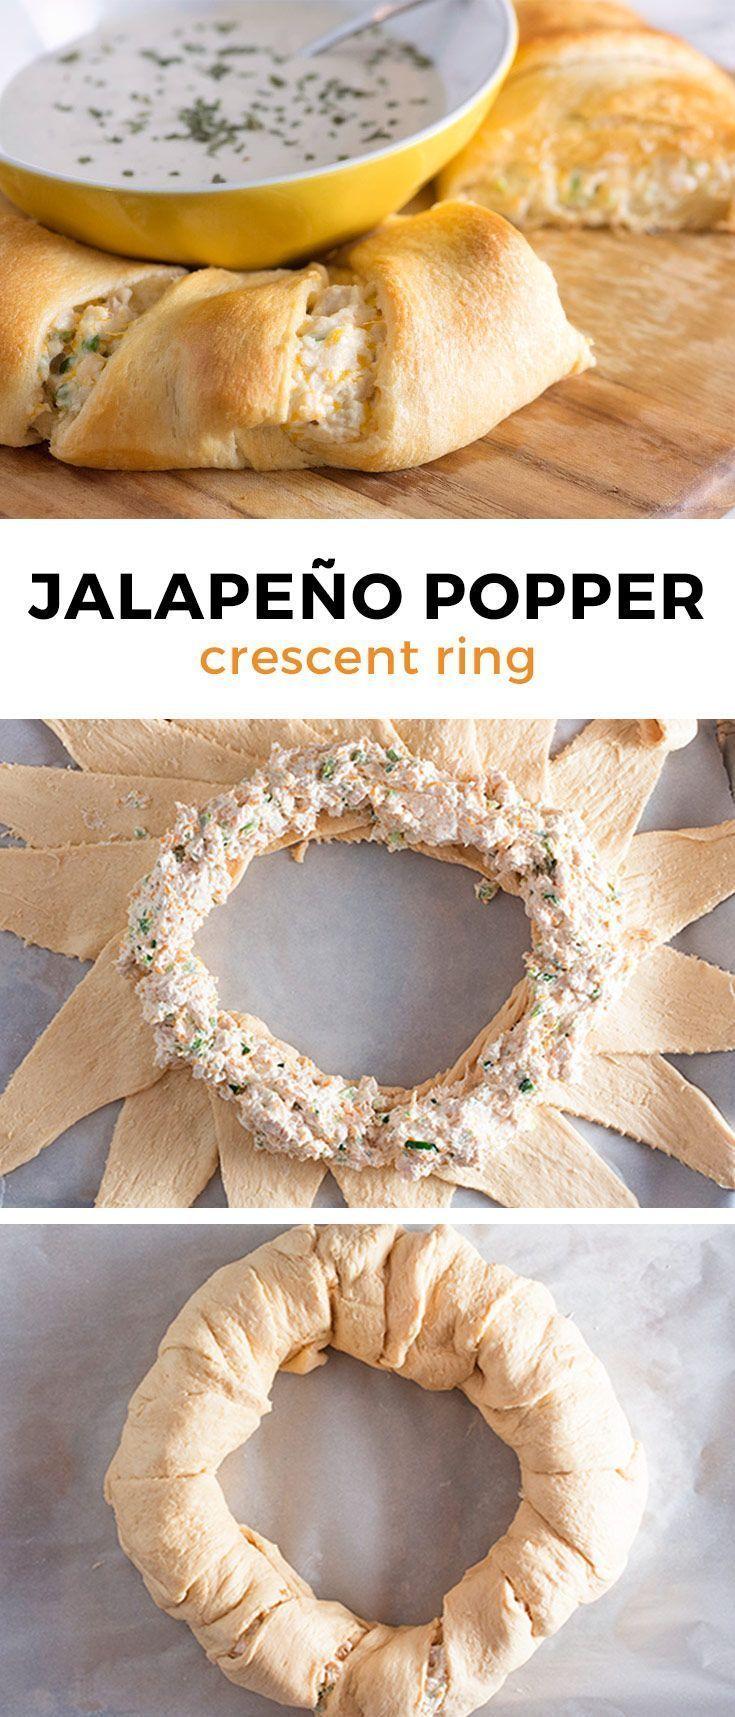 Jalapeño Popper Crescent Ring #gamedayfood